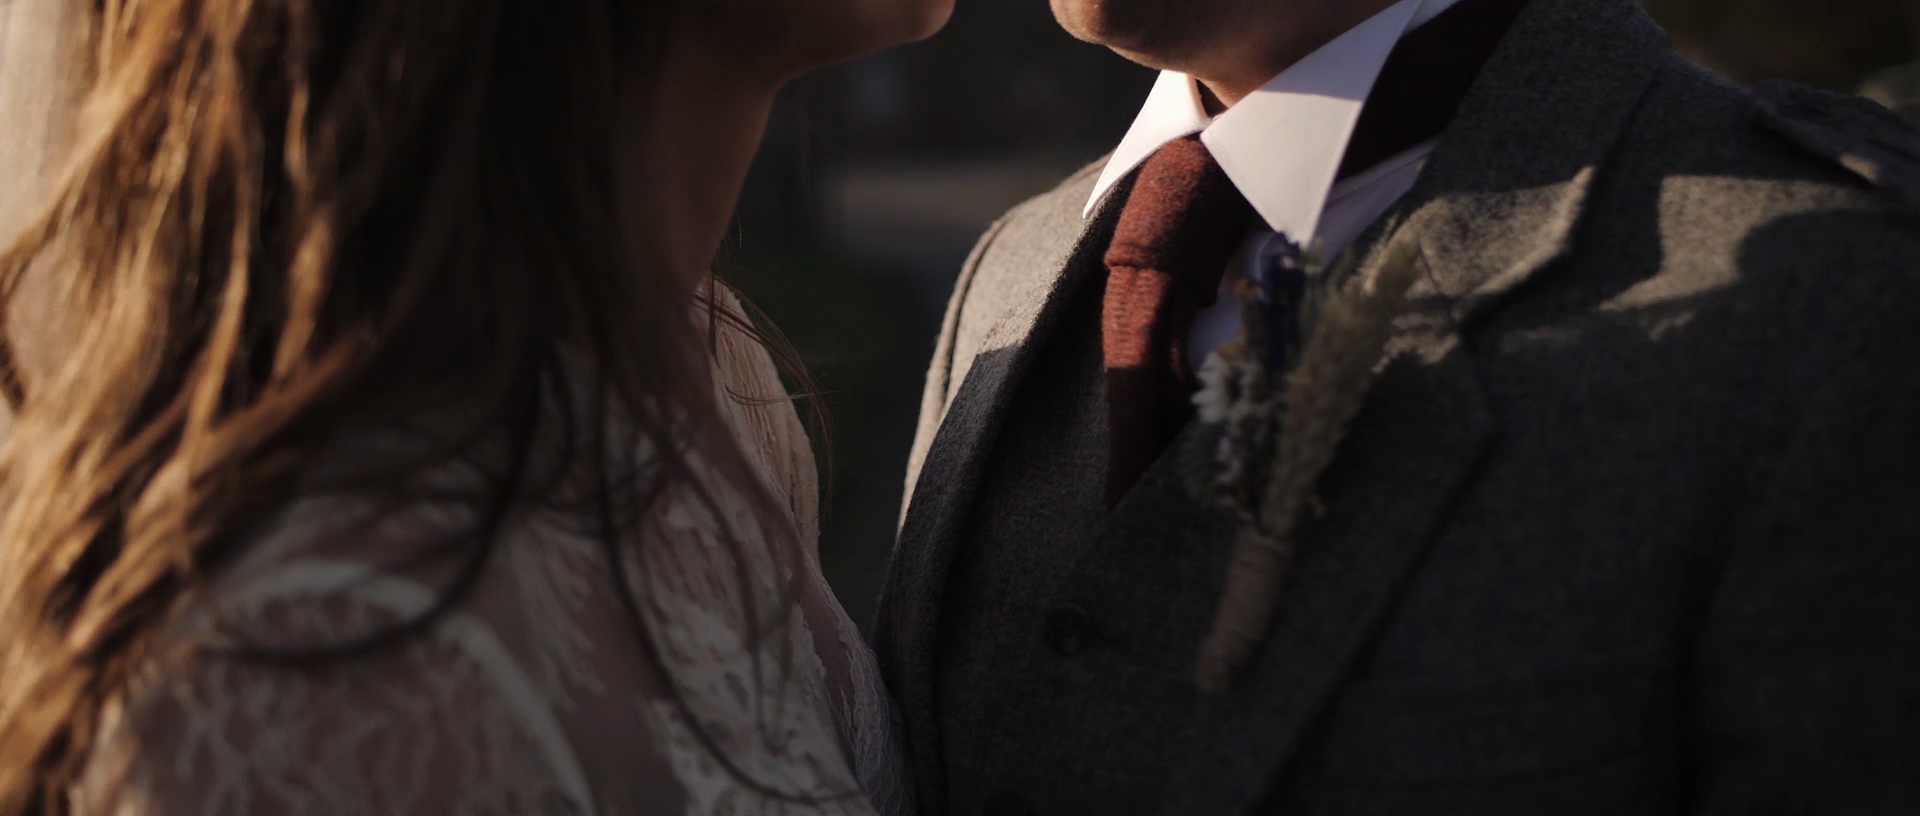 pollokshields-burgh-hall-wedding-videographer_LL_04.jpg